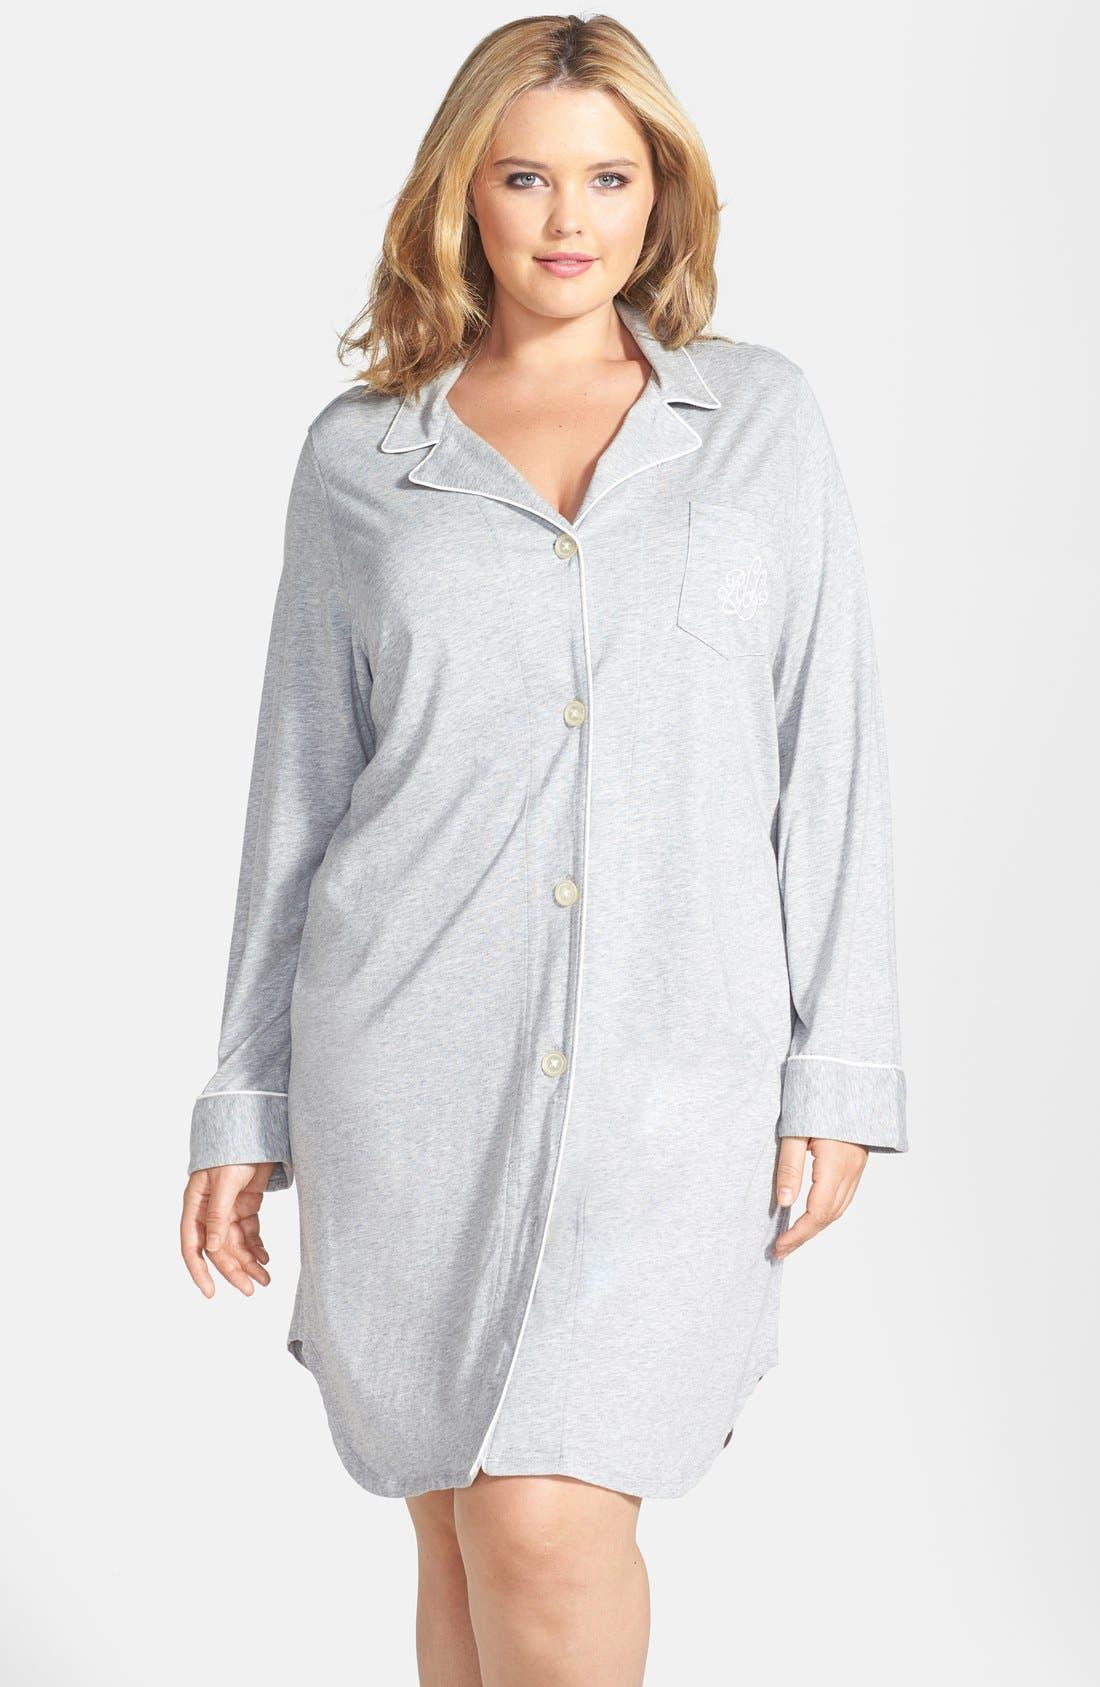 Alternate Image 1 Selected - Lauren Ralph Lauren Knit Nightshirt (Plus Size) (Online Only)